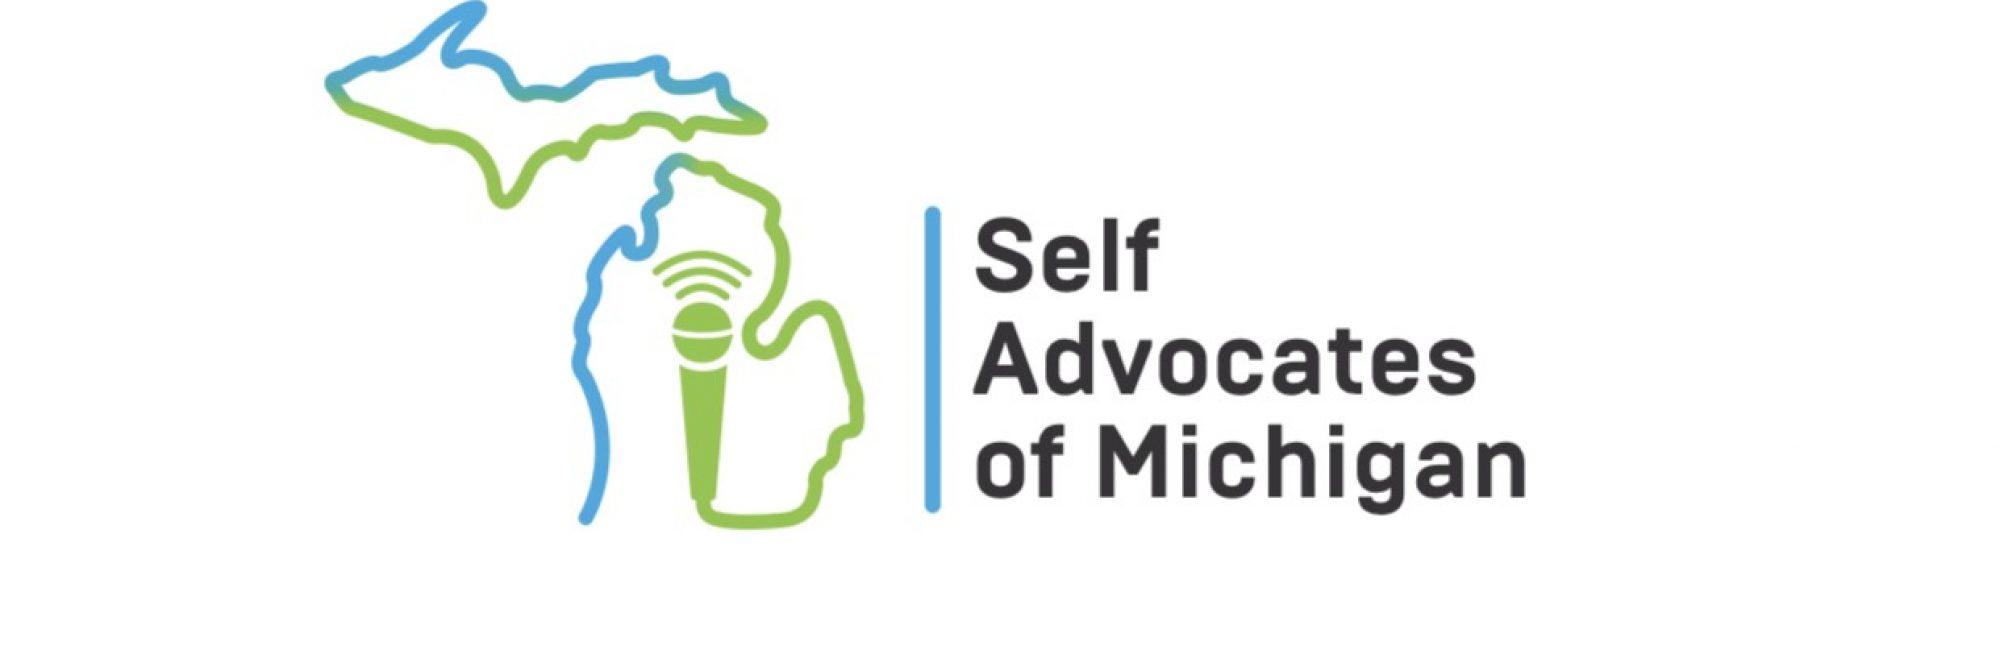 Self Advocates of Michigan (SAM)